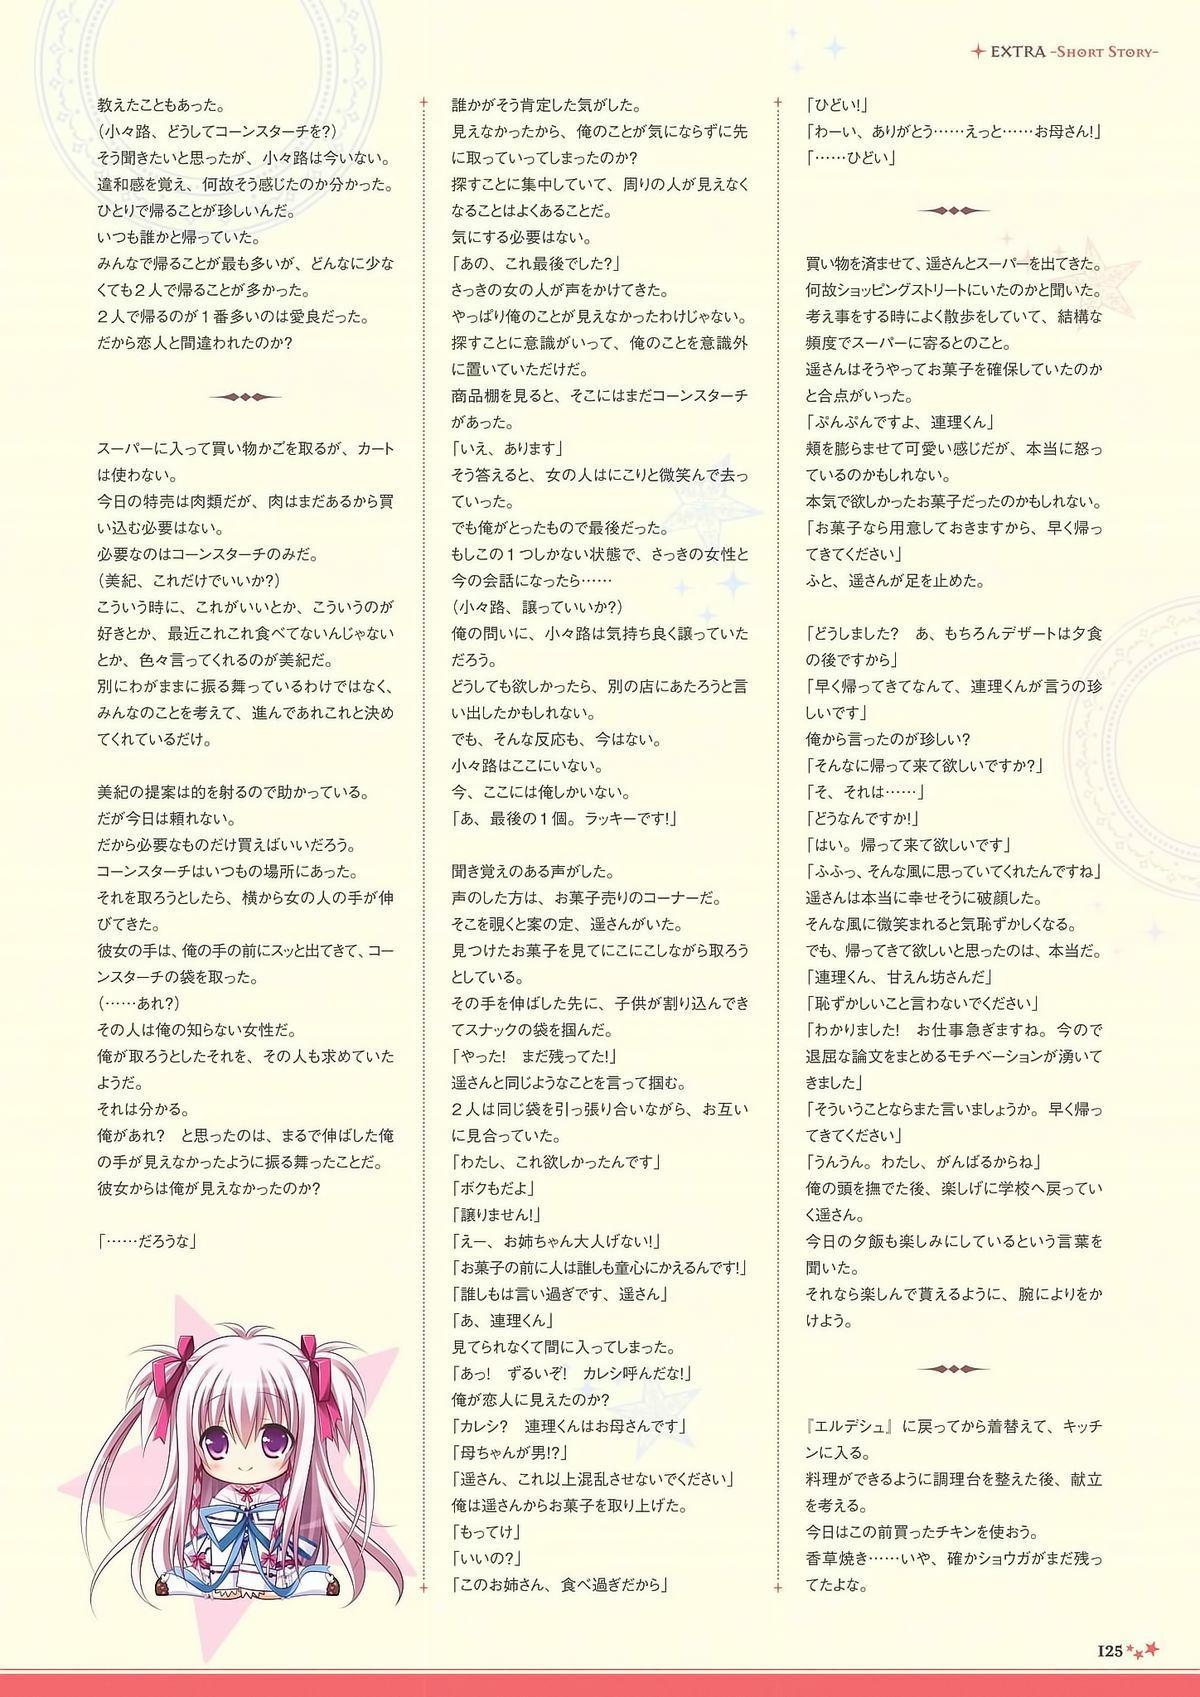 Sekai to Sekai no Mannaka de Visual Fanbook 122